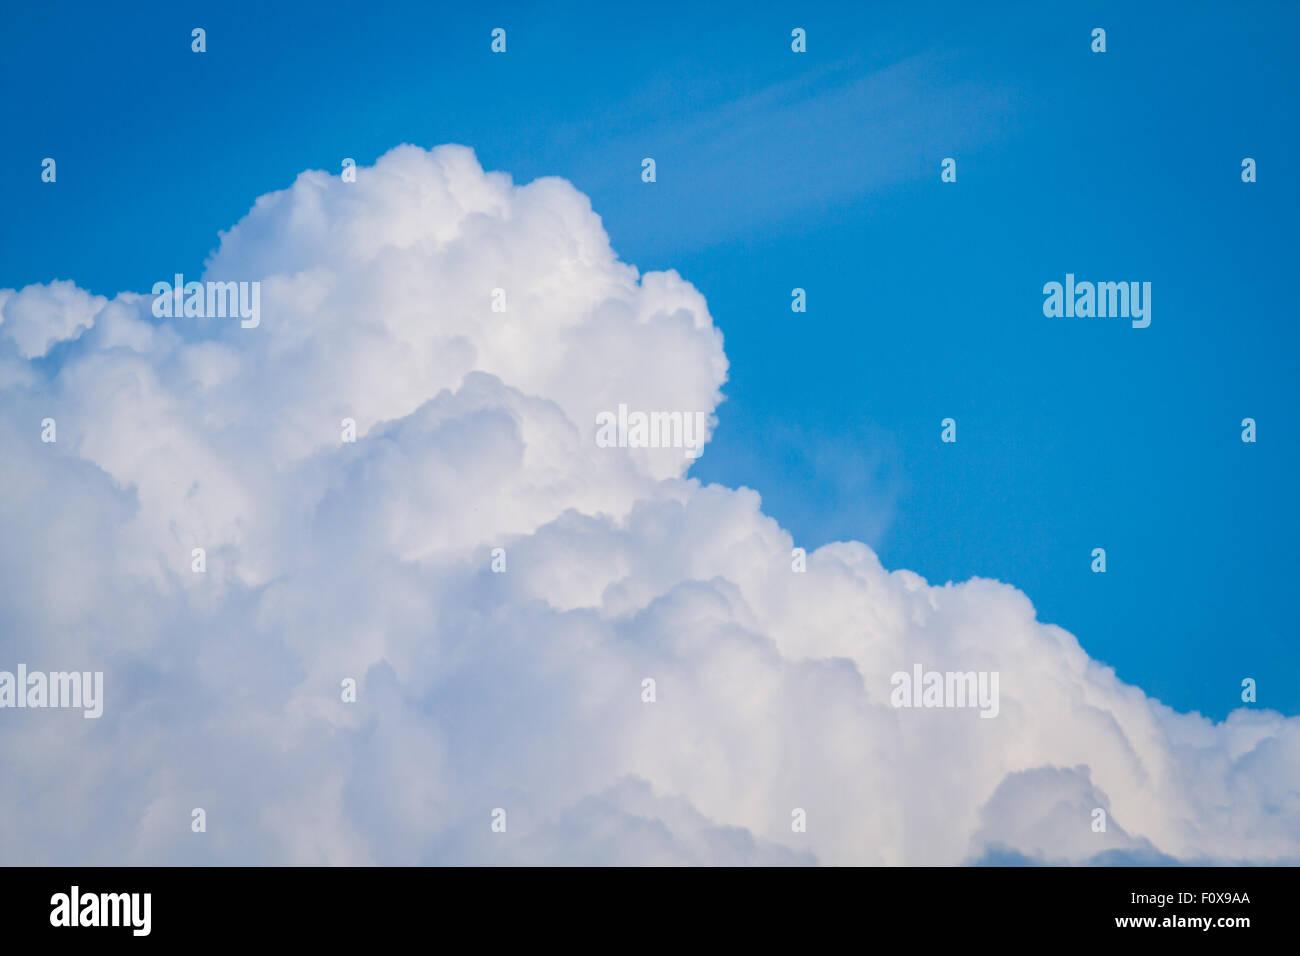 cumulonimbus clouds against a beautiful blue sky - Stock Image